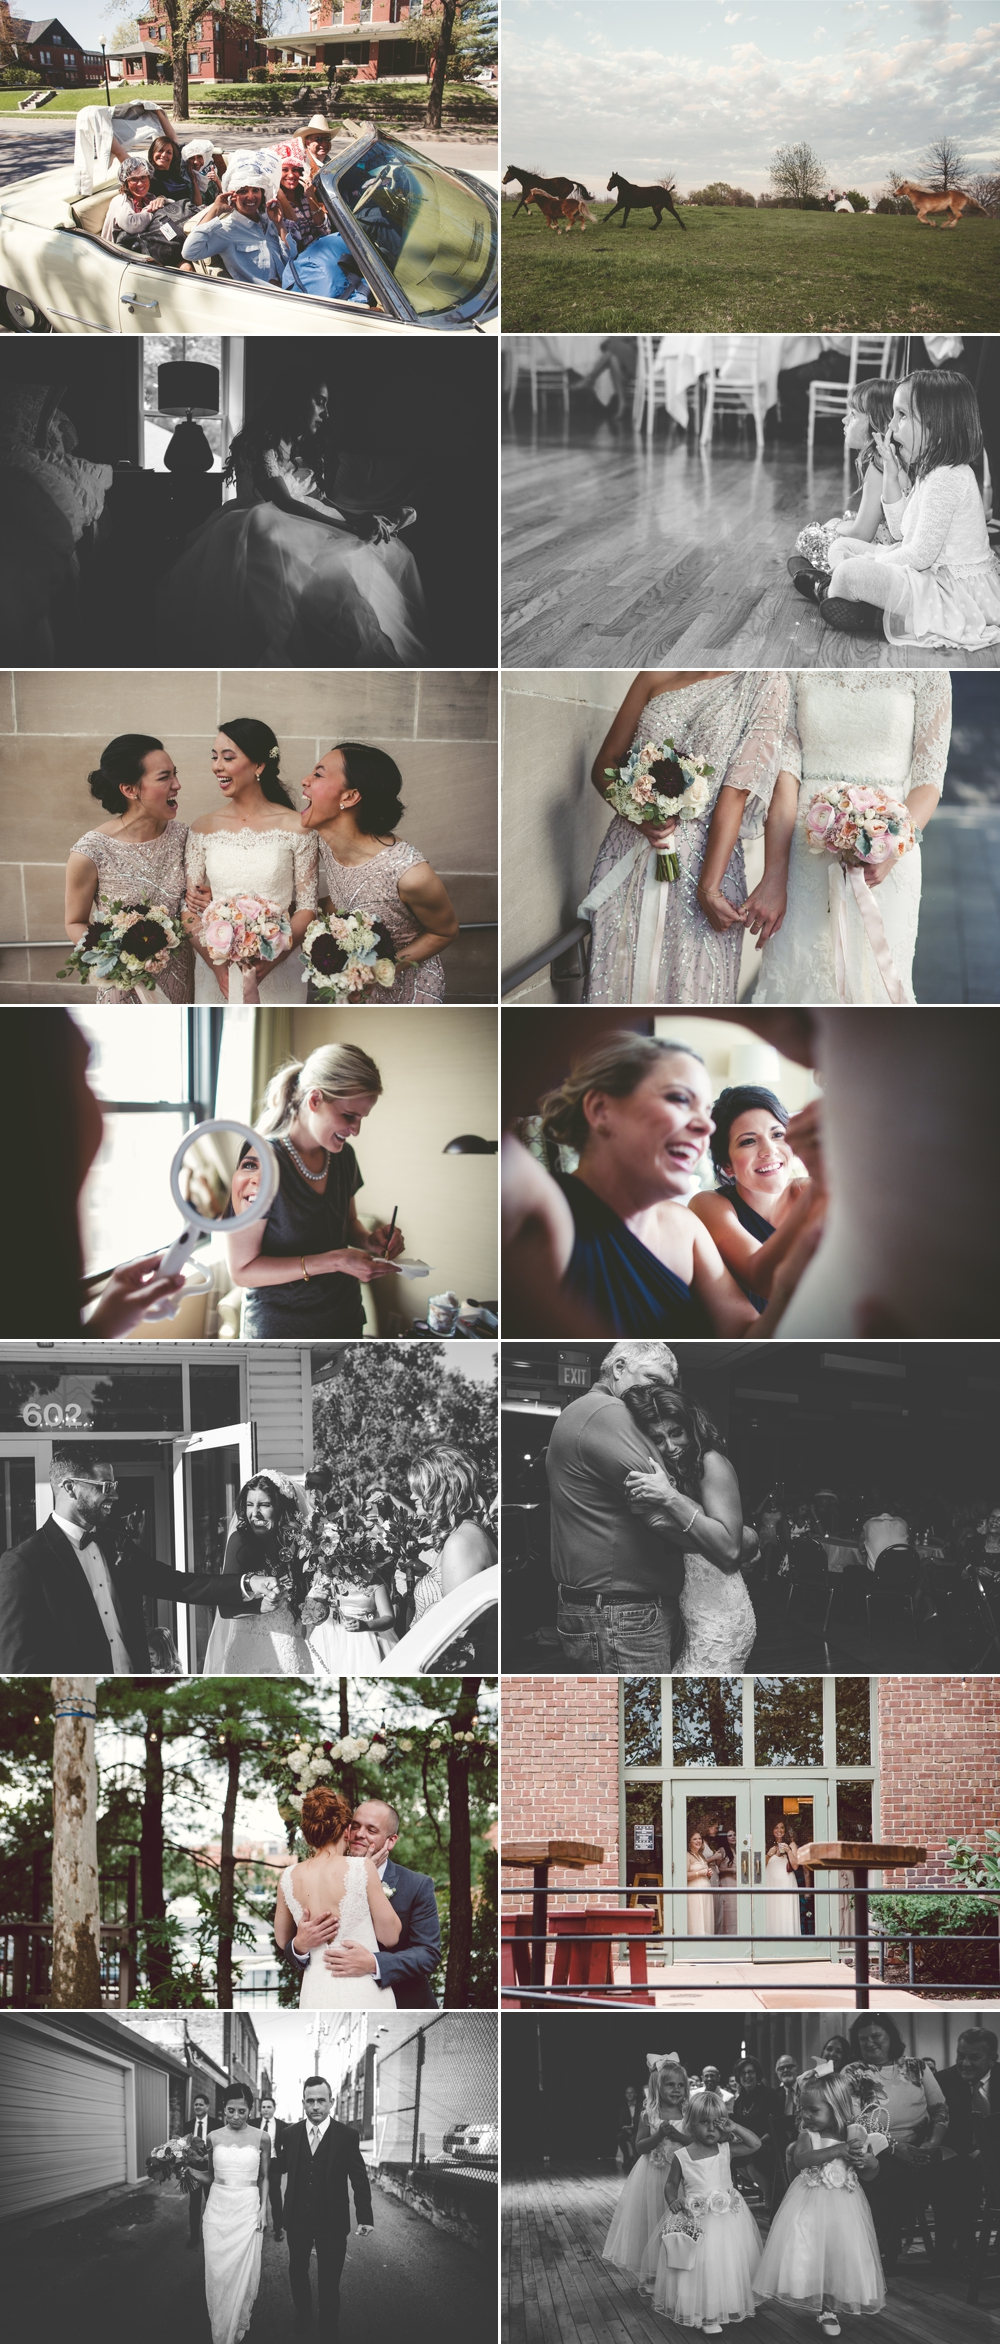 jason_domingues_photography_best_kansas_city_photography_kc_wedding_weddings0005.jpg